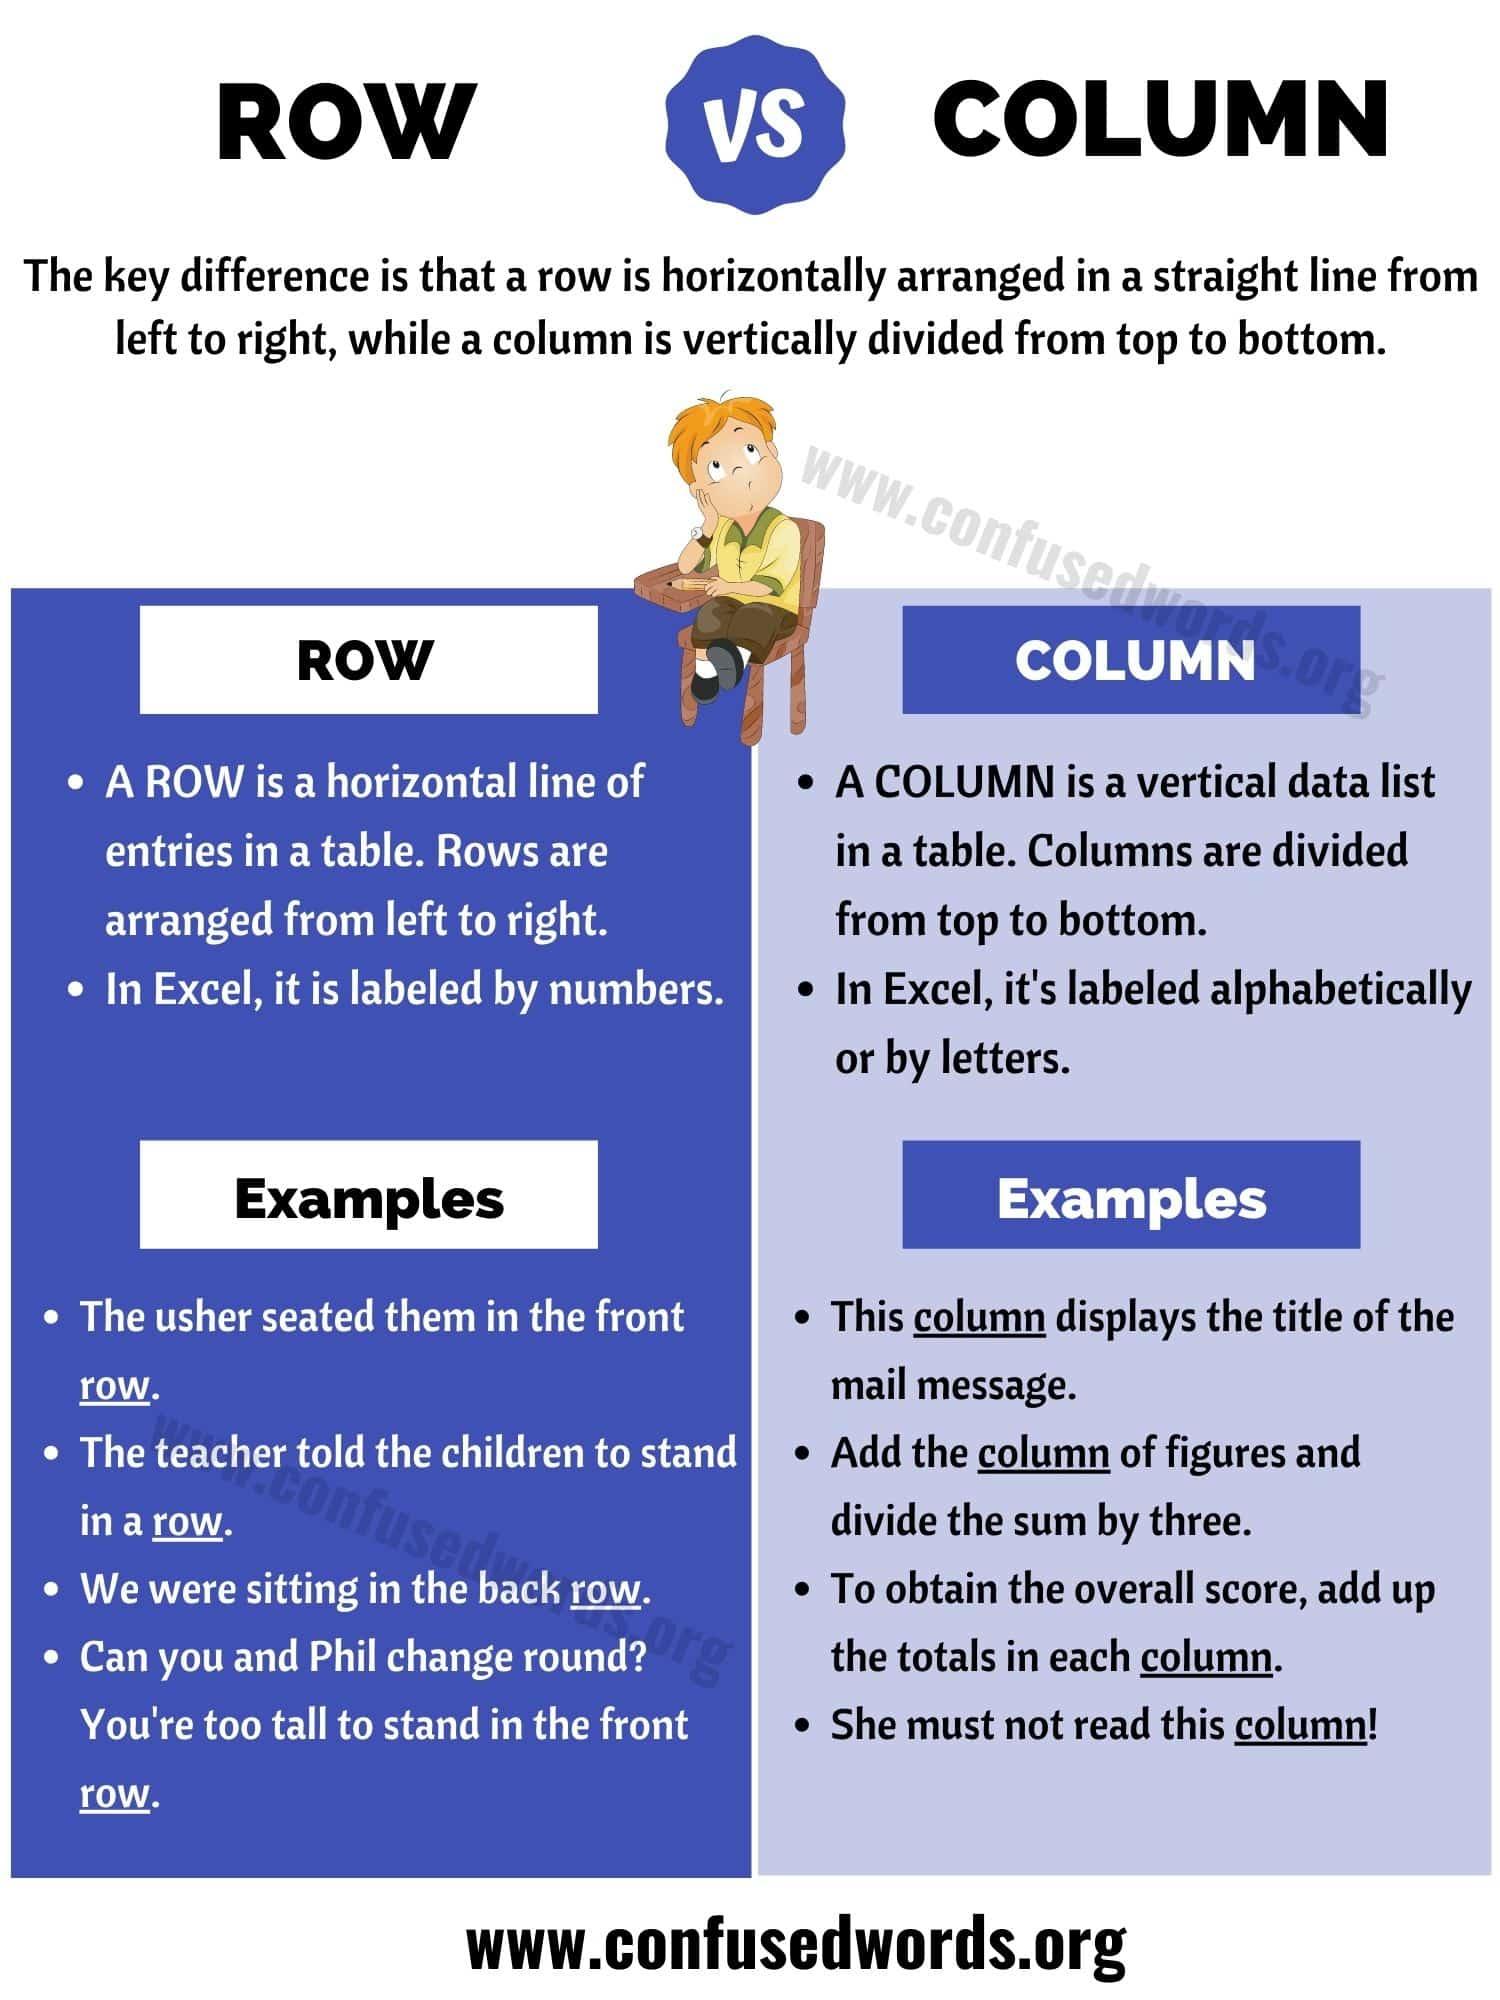 Row vs Column